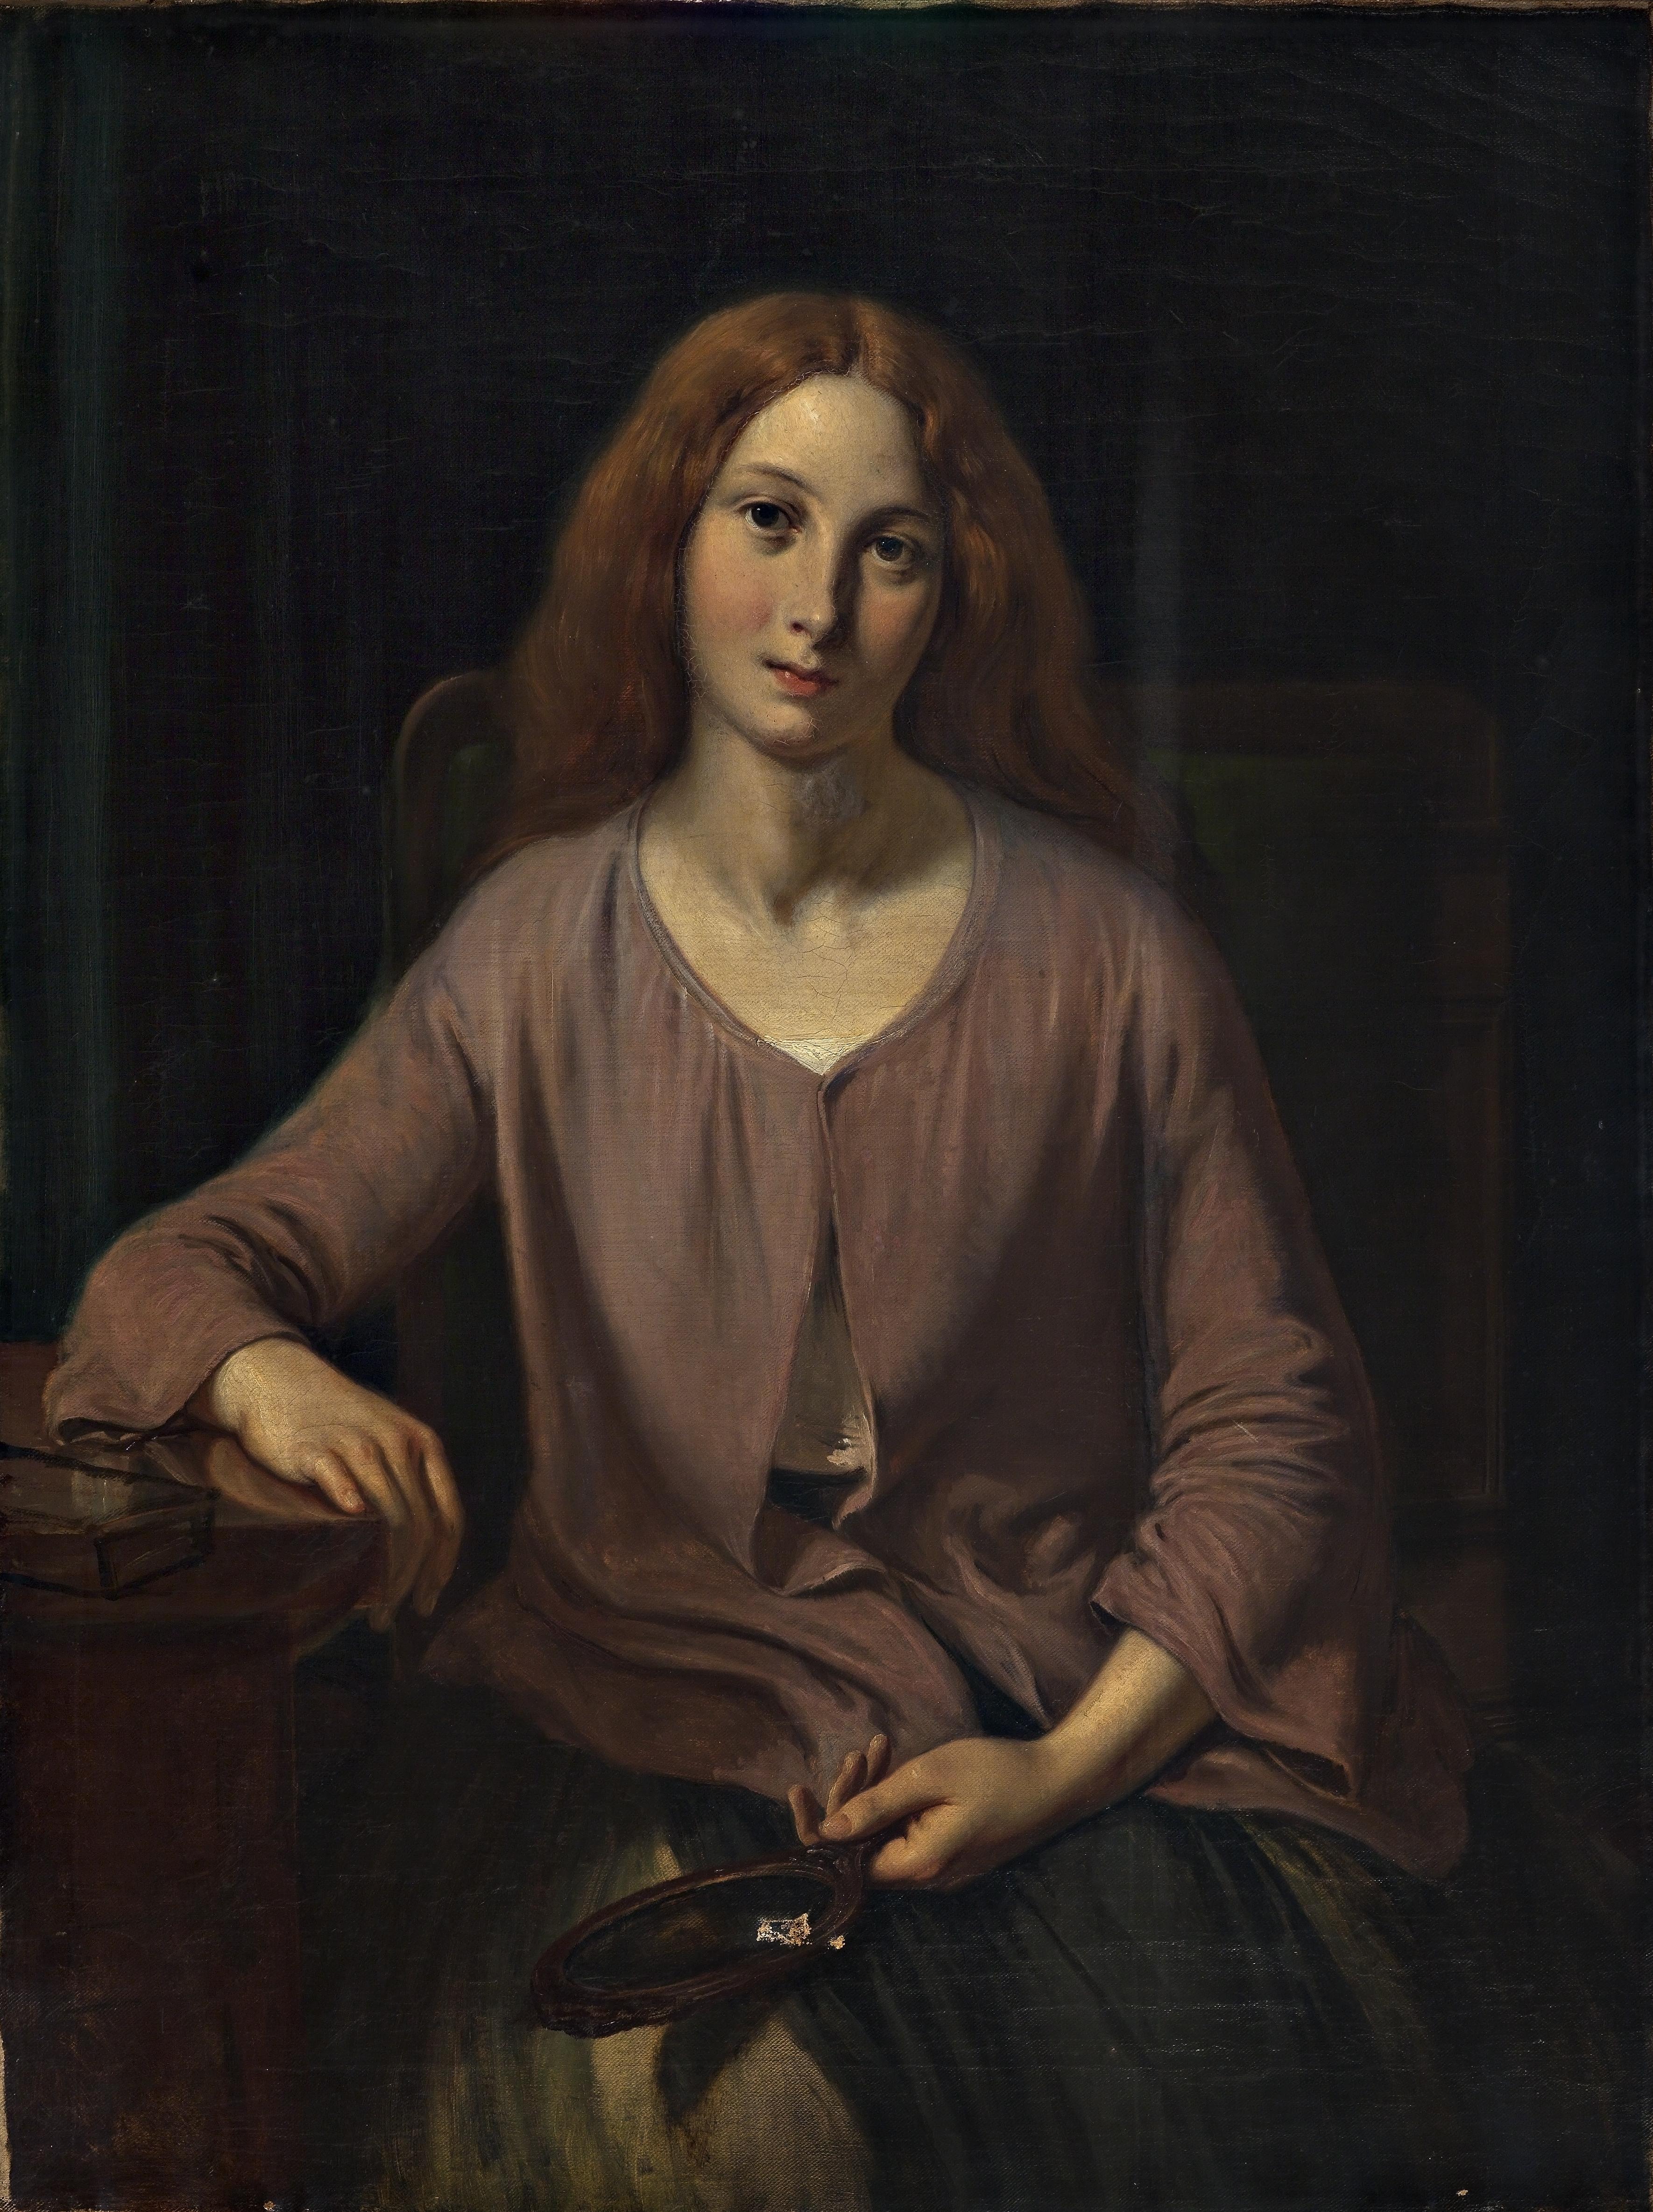 Maleri af Wilhelm Marstrand , Venetianerinde ved toilettet, 1854. Nivaagaards Malerisamling